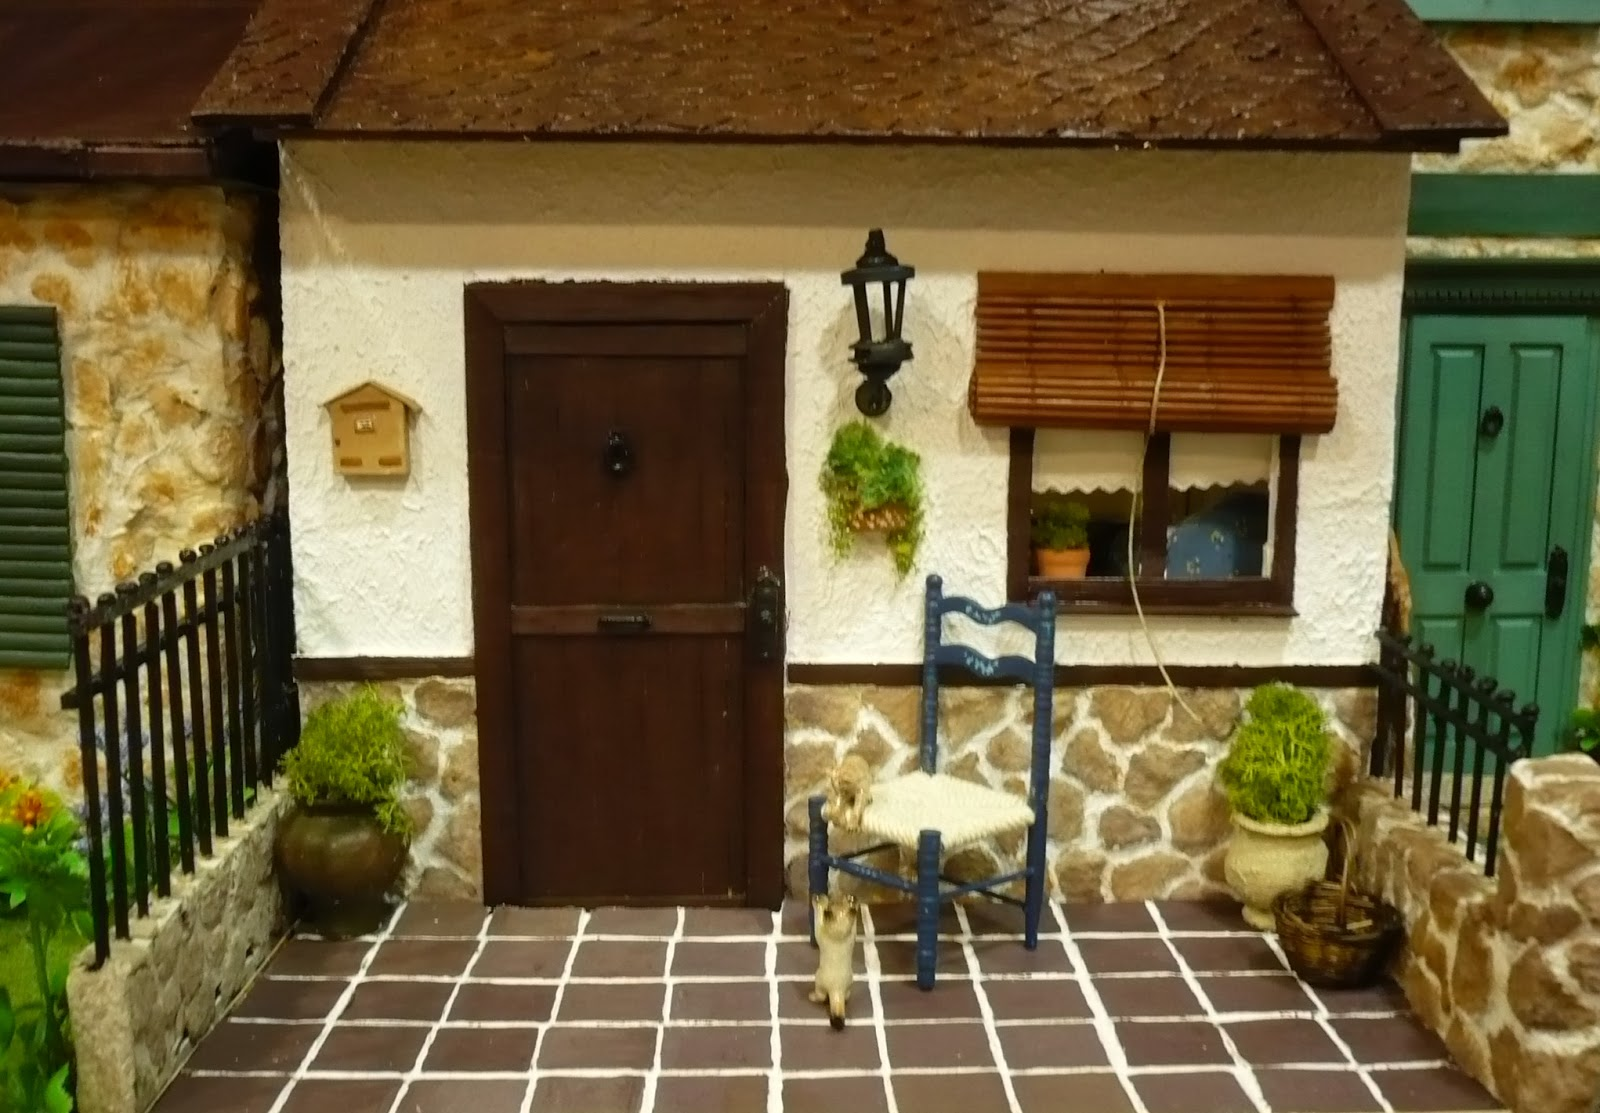 Top colores para casas por fuera images for pinterest tattoos for Colores para pintar una casa pequena por fuera